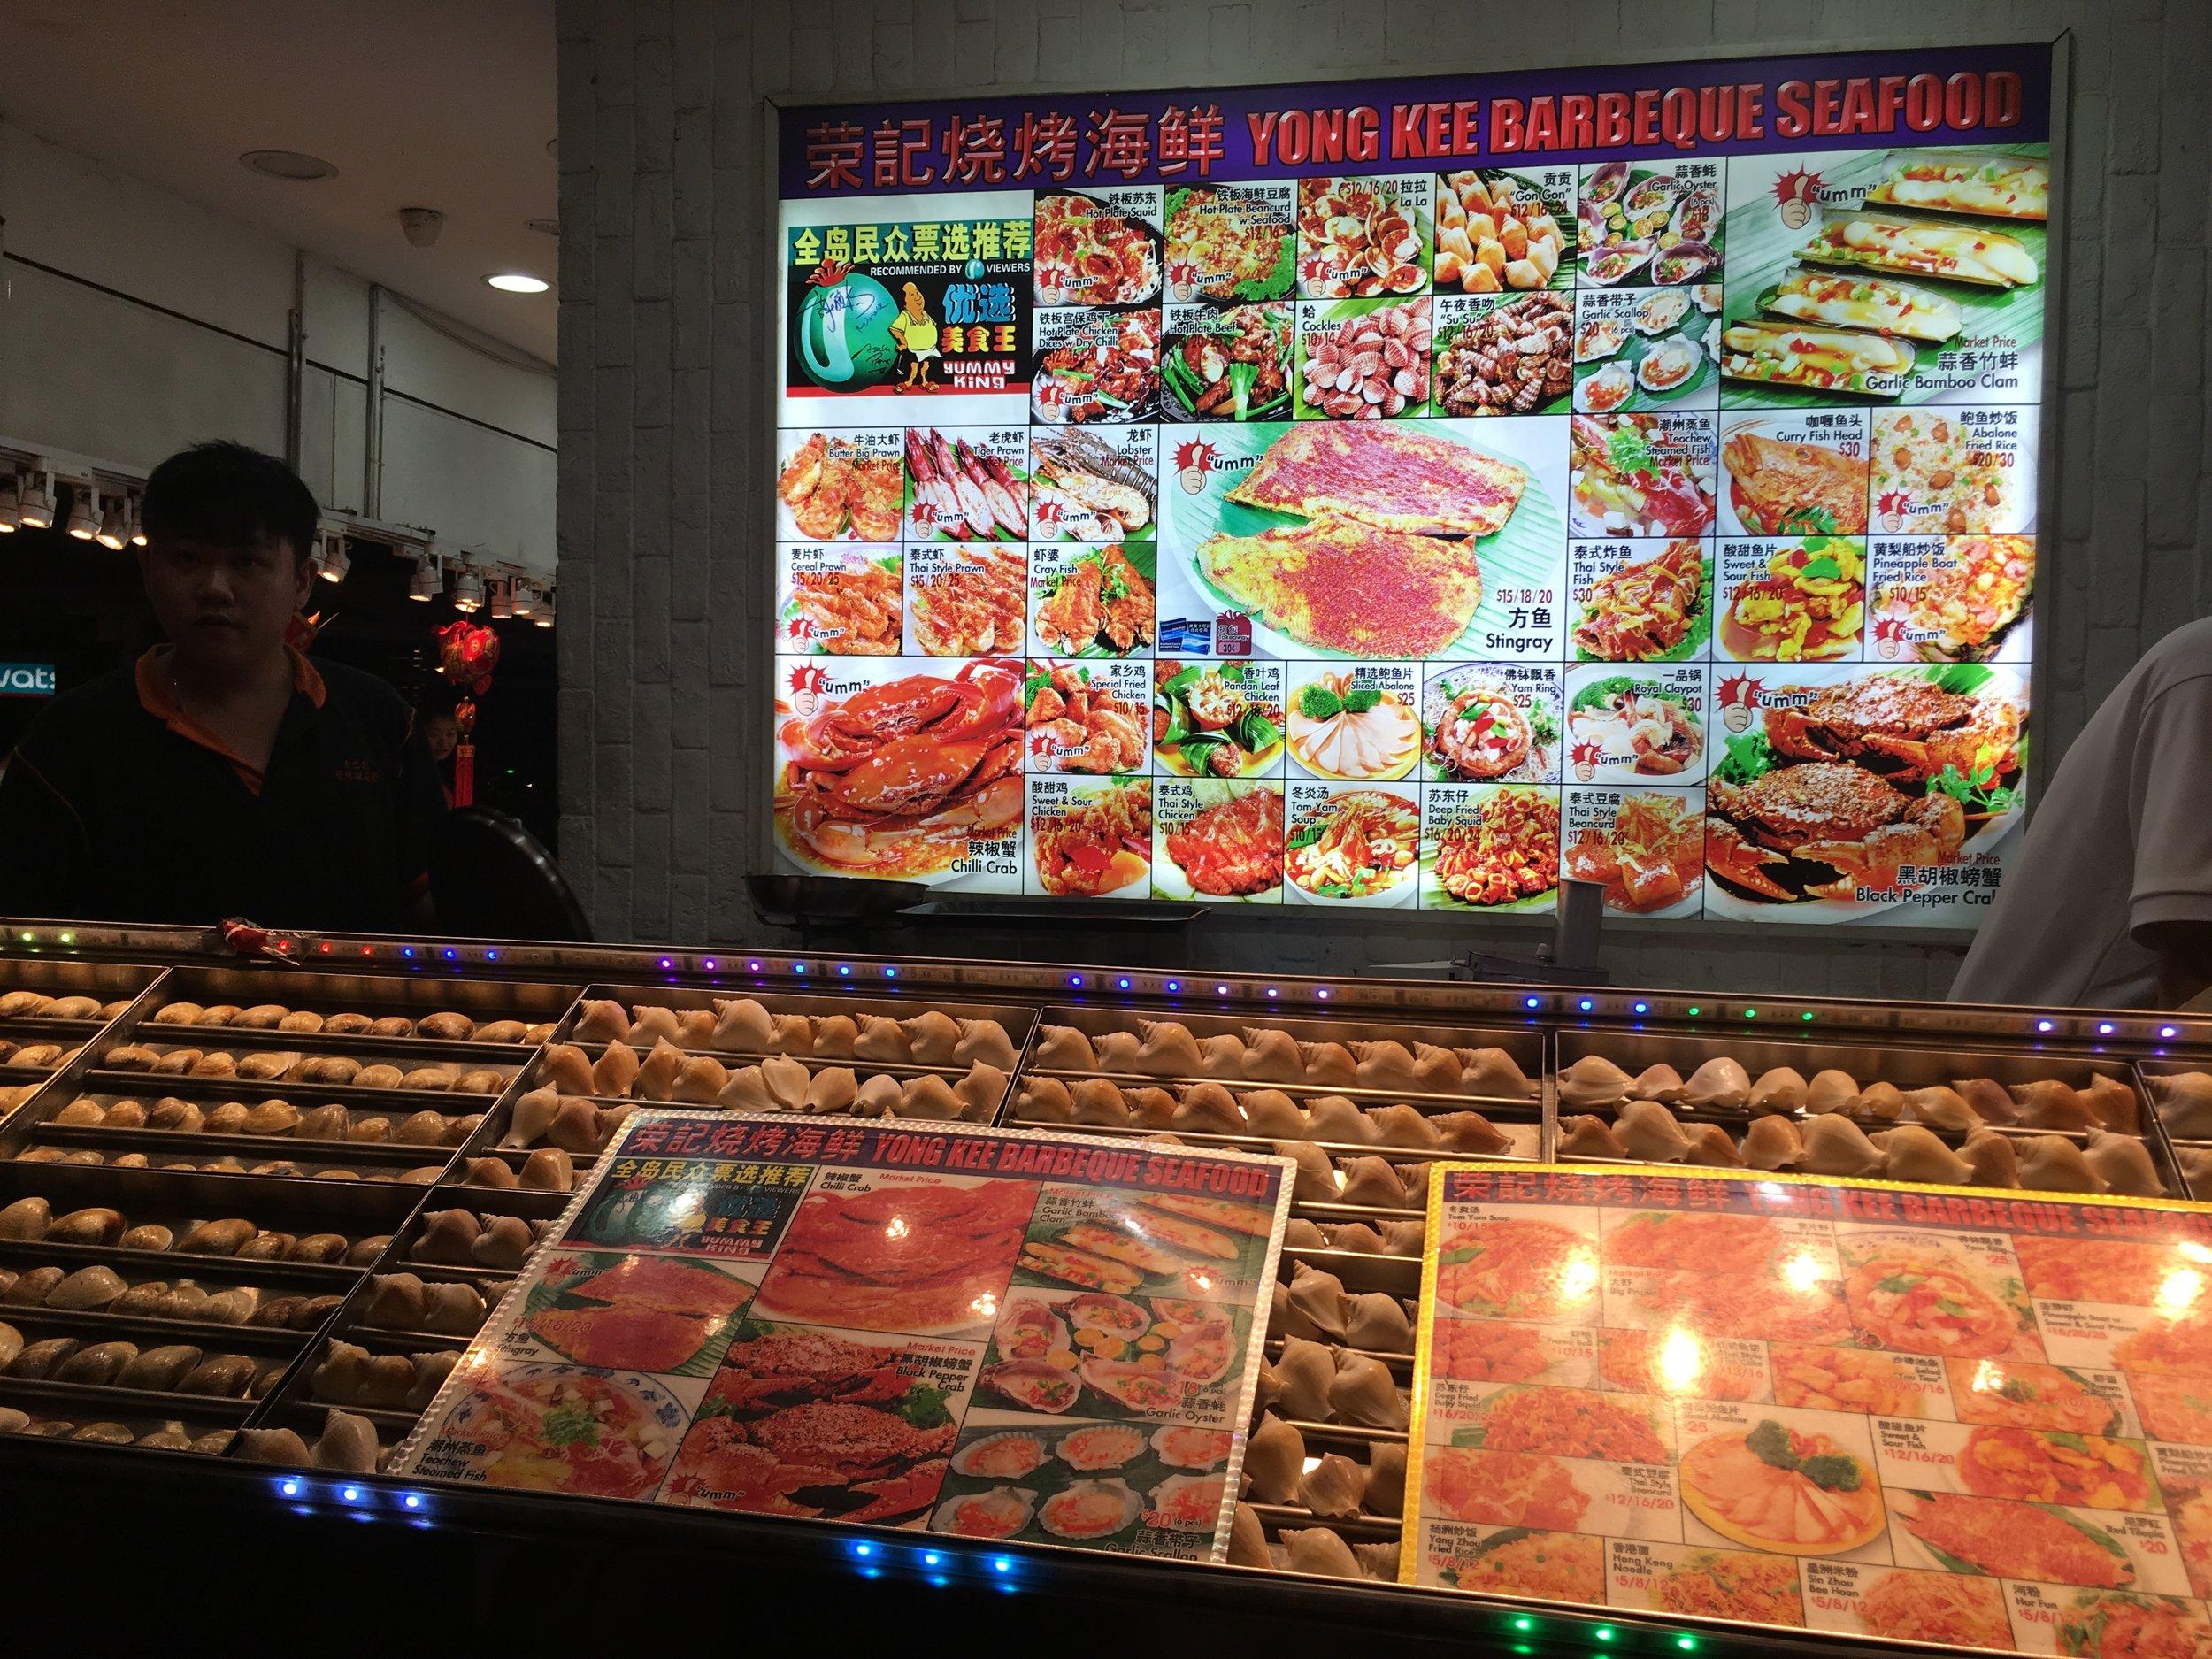 Yong Kee BBQ Seafood.jpg